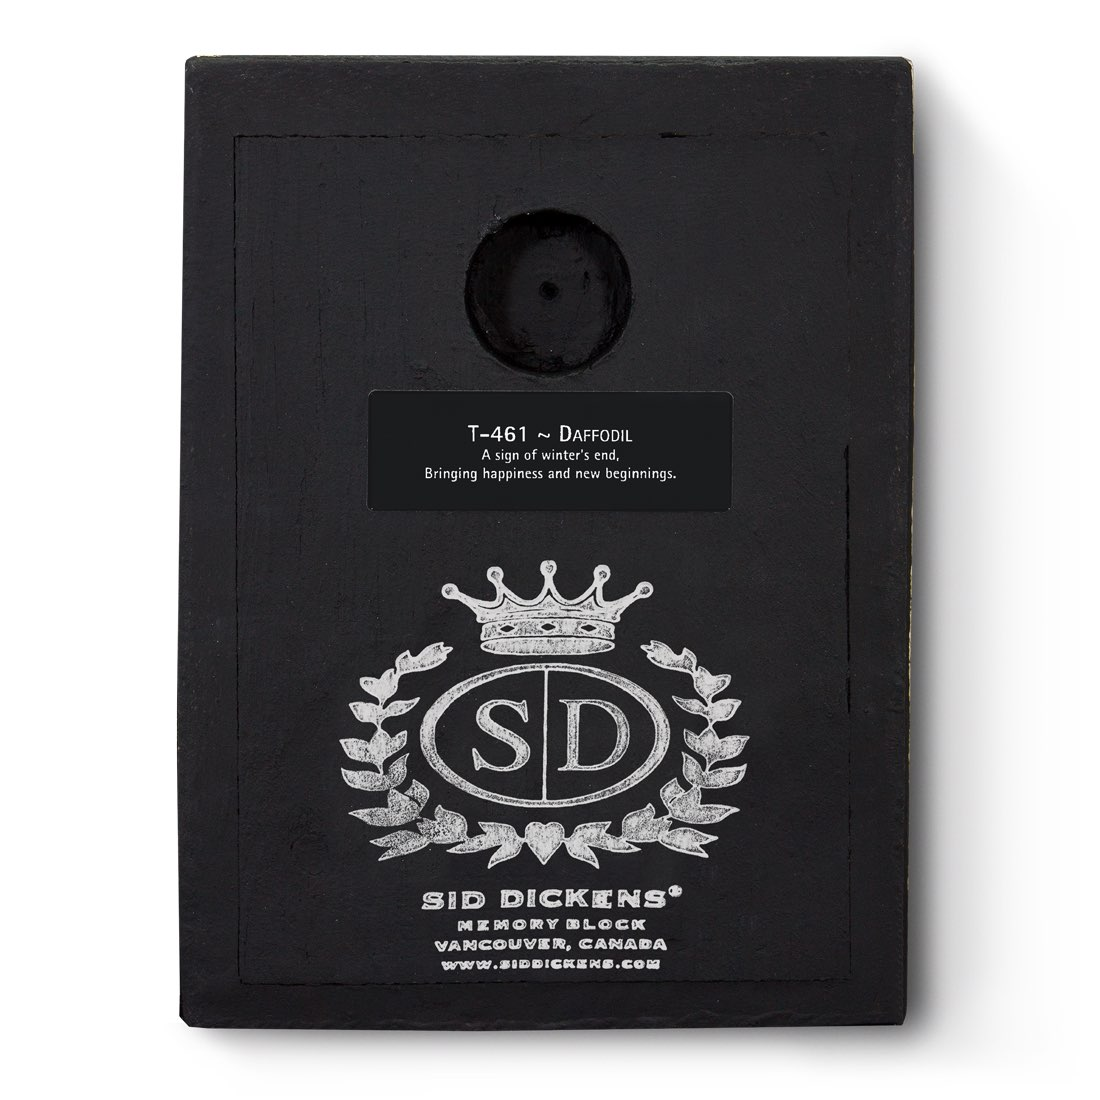 T461 - Daffodil *retired* - Memory Block Sid Dickens